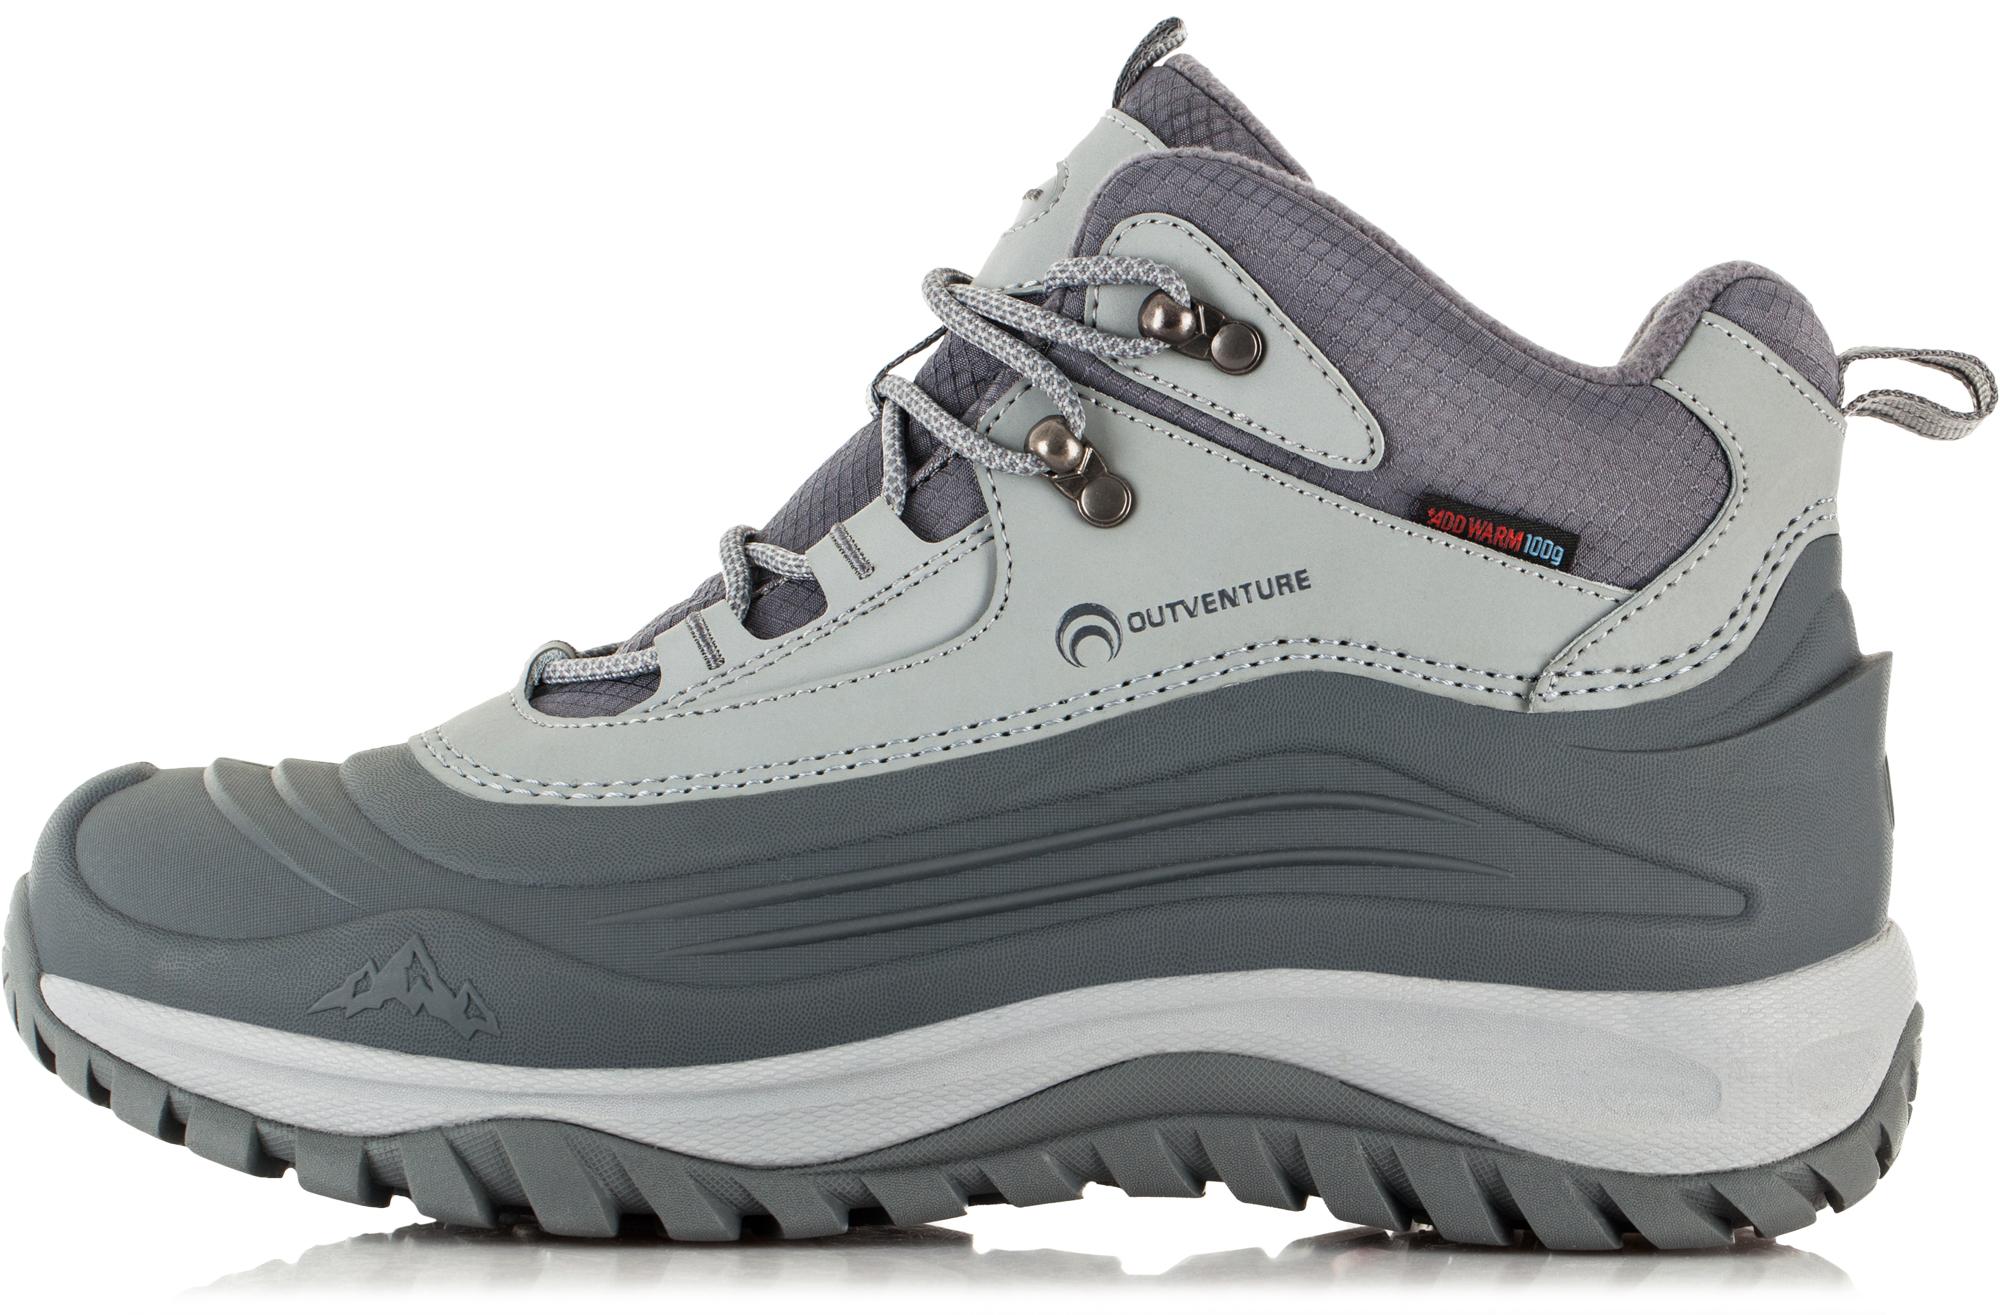 Outventure Ботинки утепленные мужские Outventure Snowstorm, размер 46 outventure ботинки утепленные для мальчиков outventure